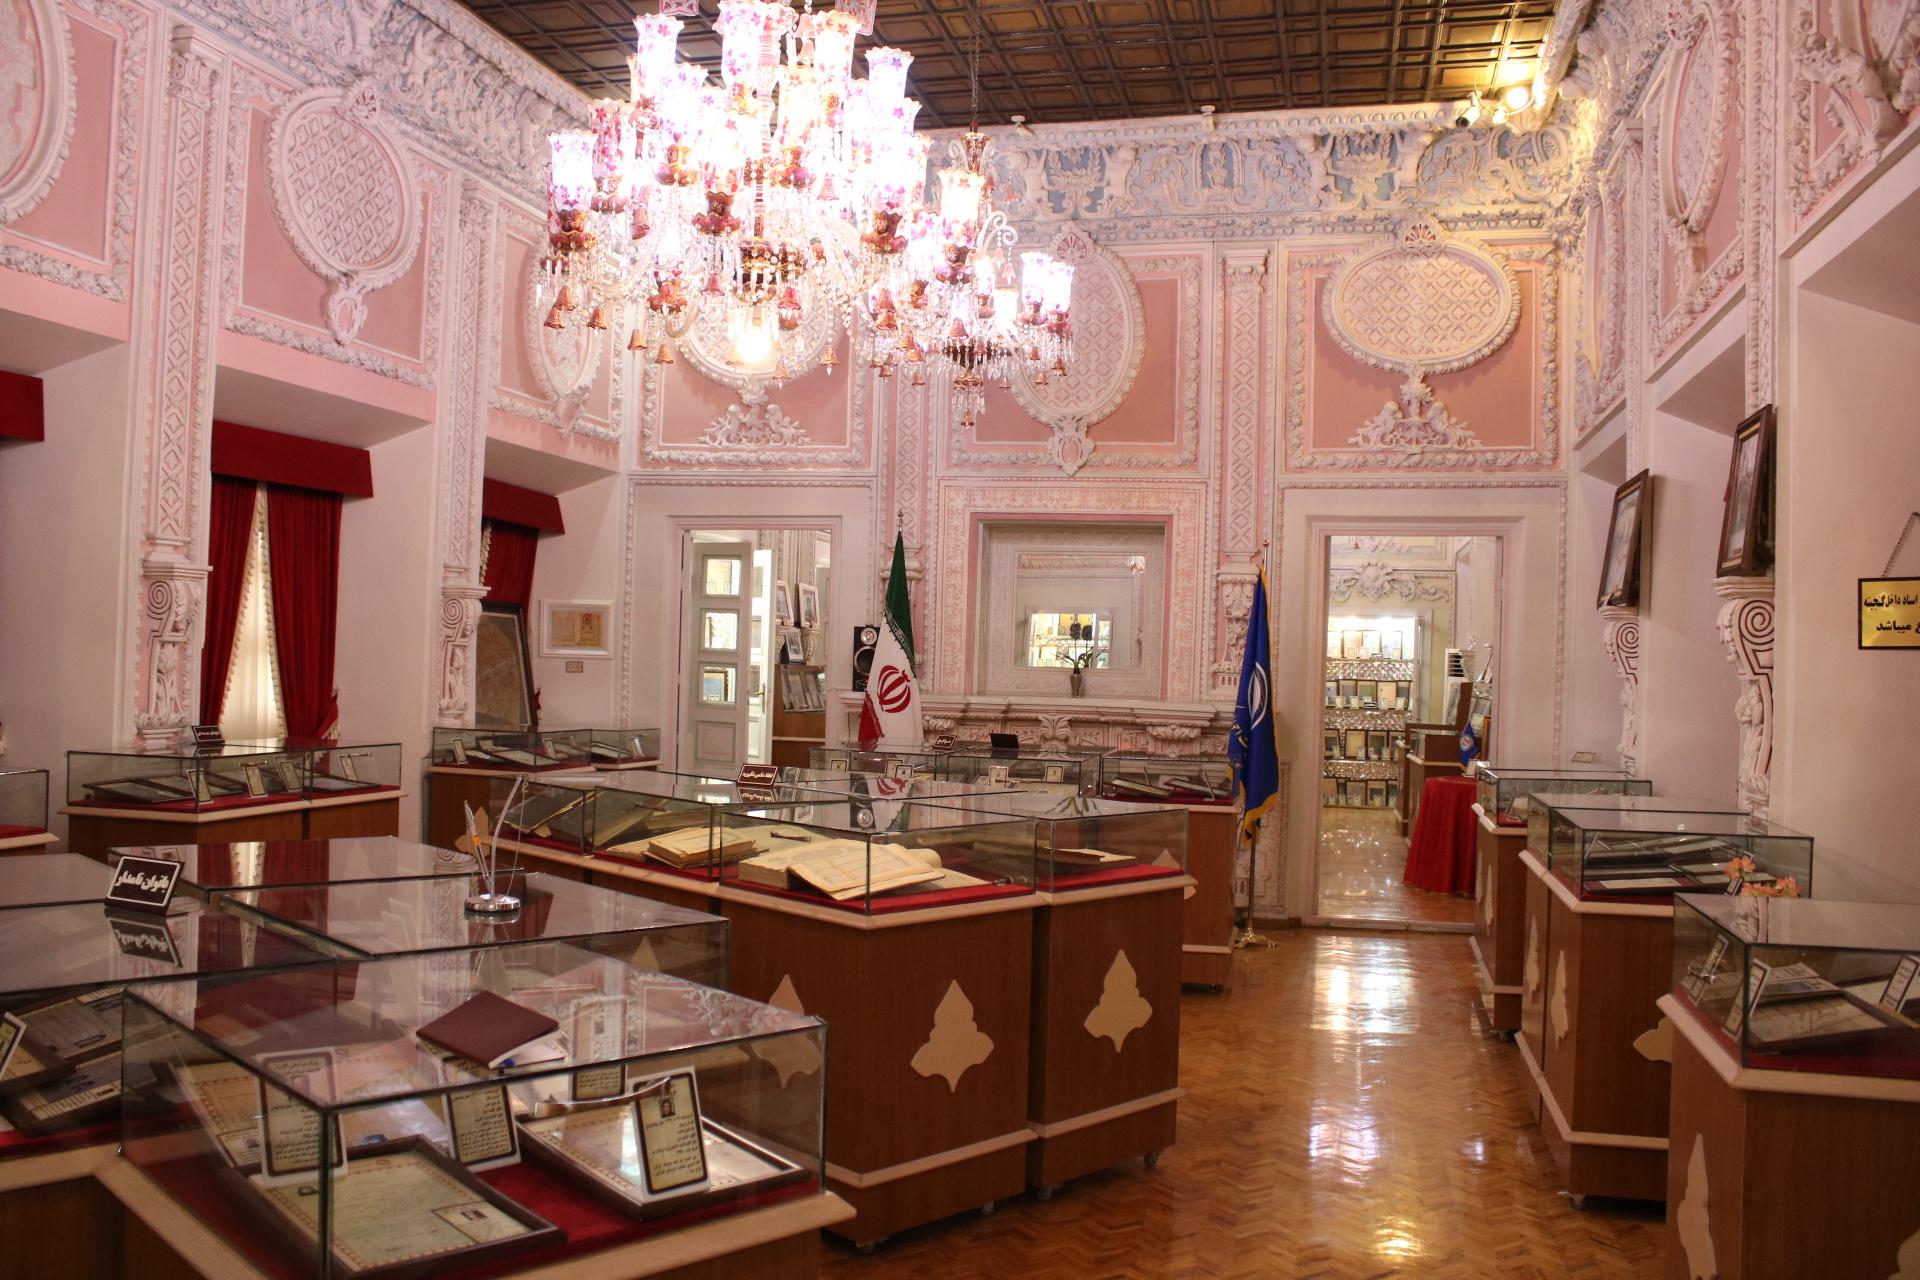 تهران گردی، موزه ثبت احوال